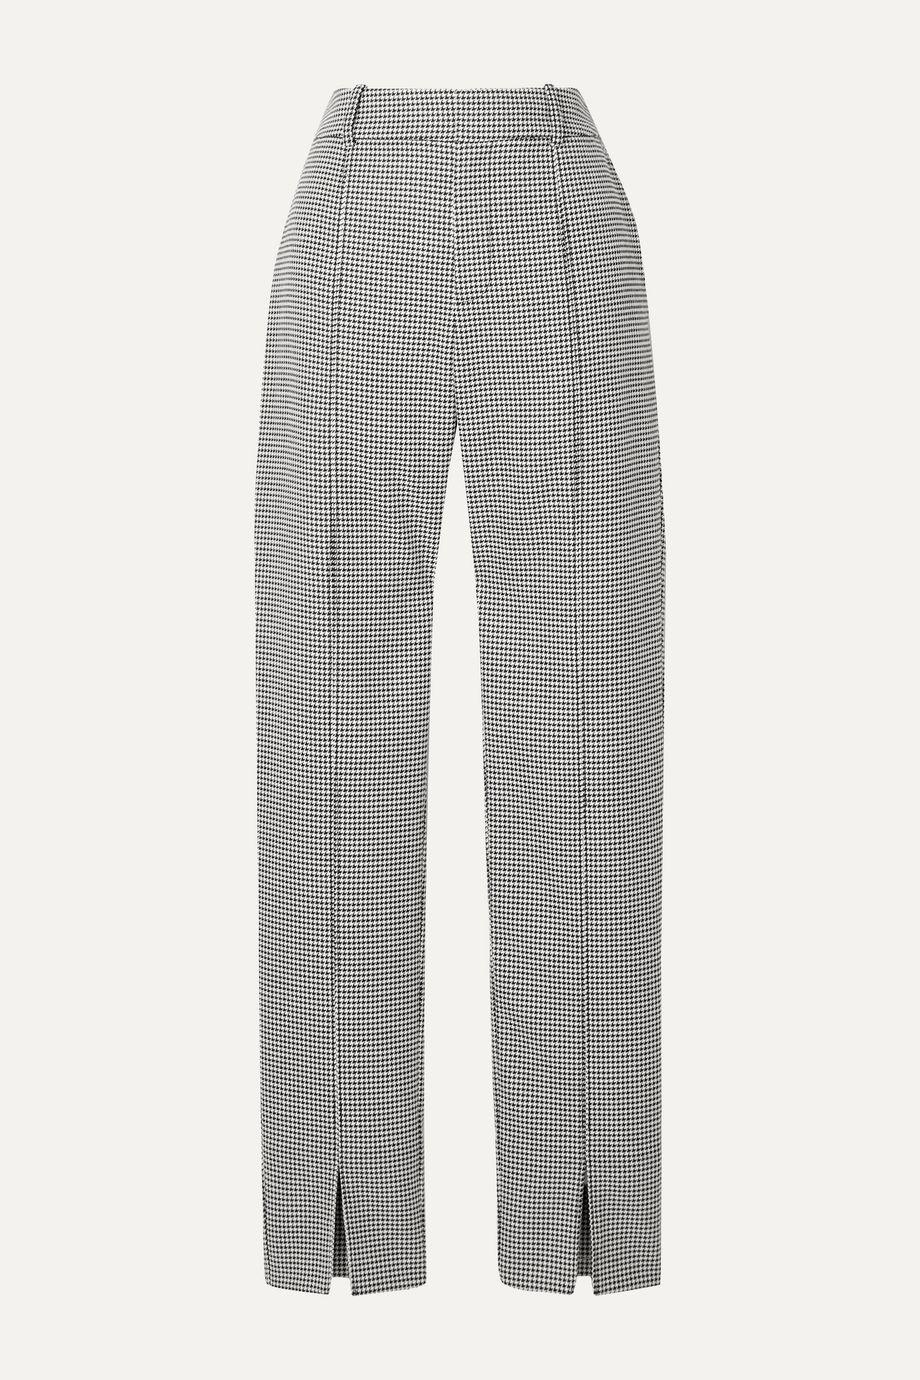 Jason Wu Houndstooth woven straight-leg pants